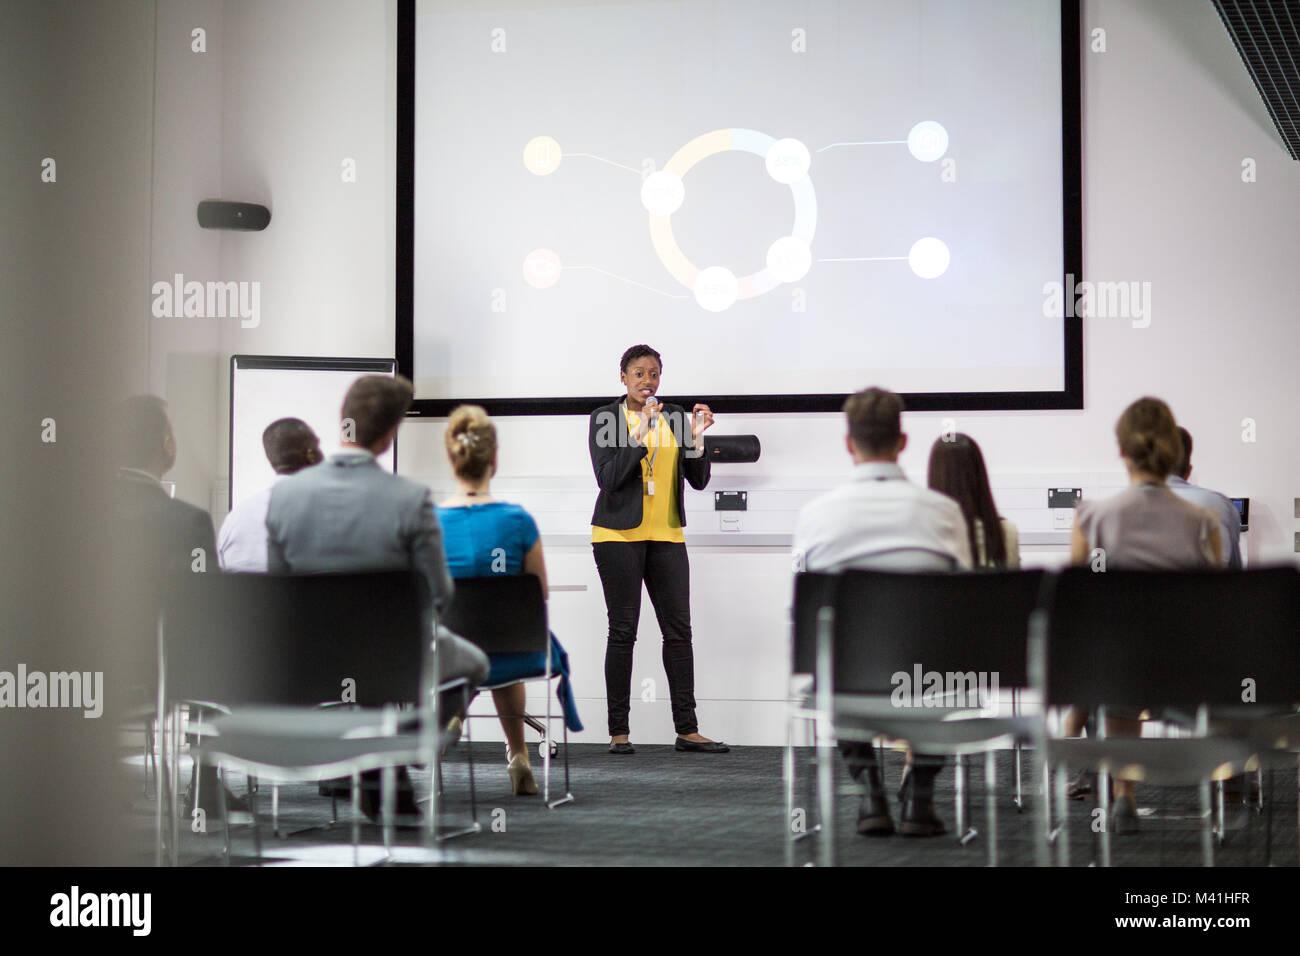 Female Executive Leading A Training Conference Stock Photo